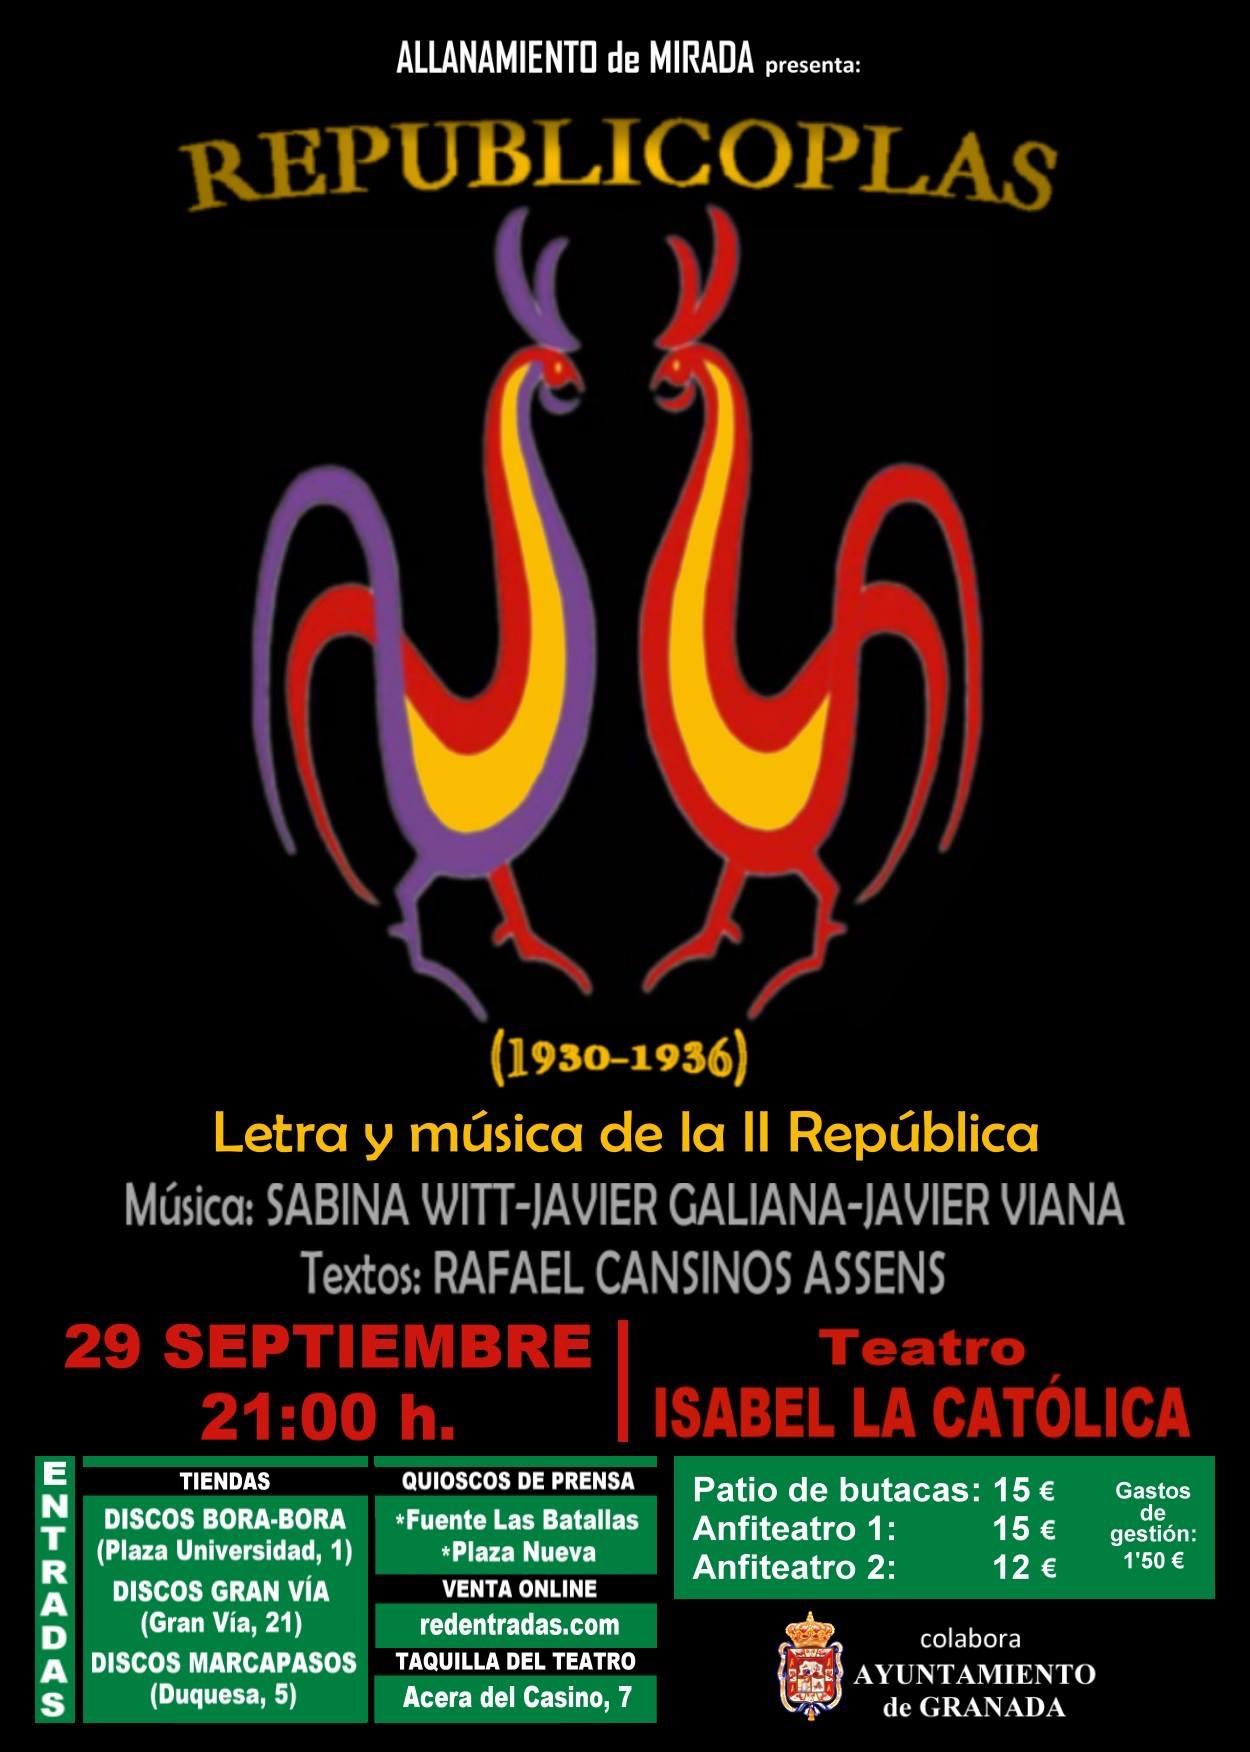 29 de septiembre- Republicoplas- Teatro Isabel La Católica (Granada)- 21:30h